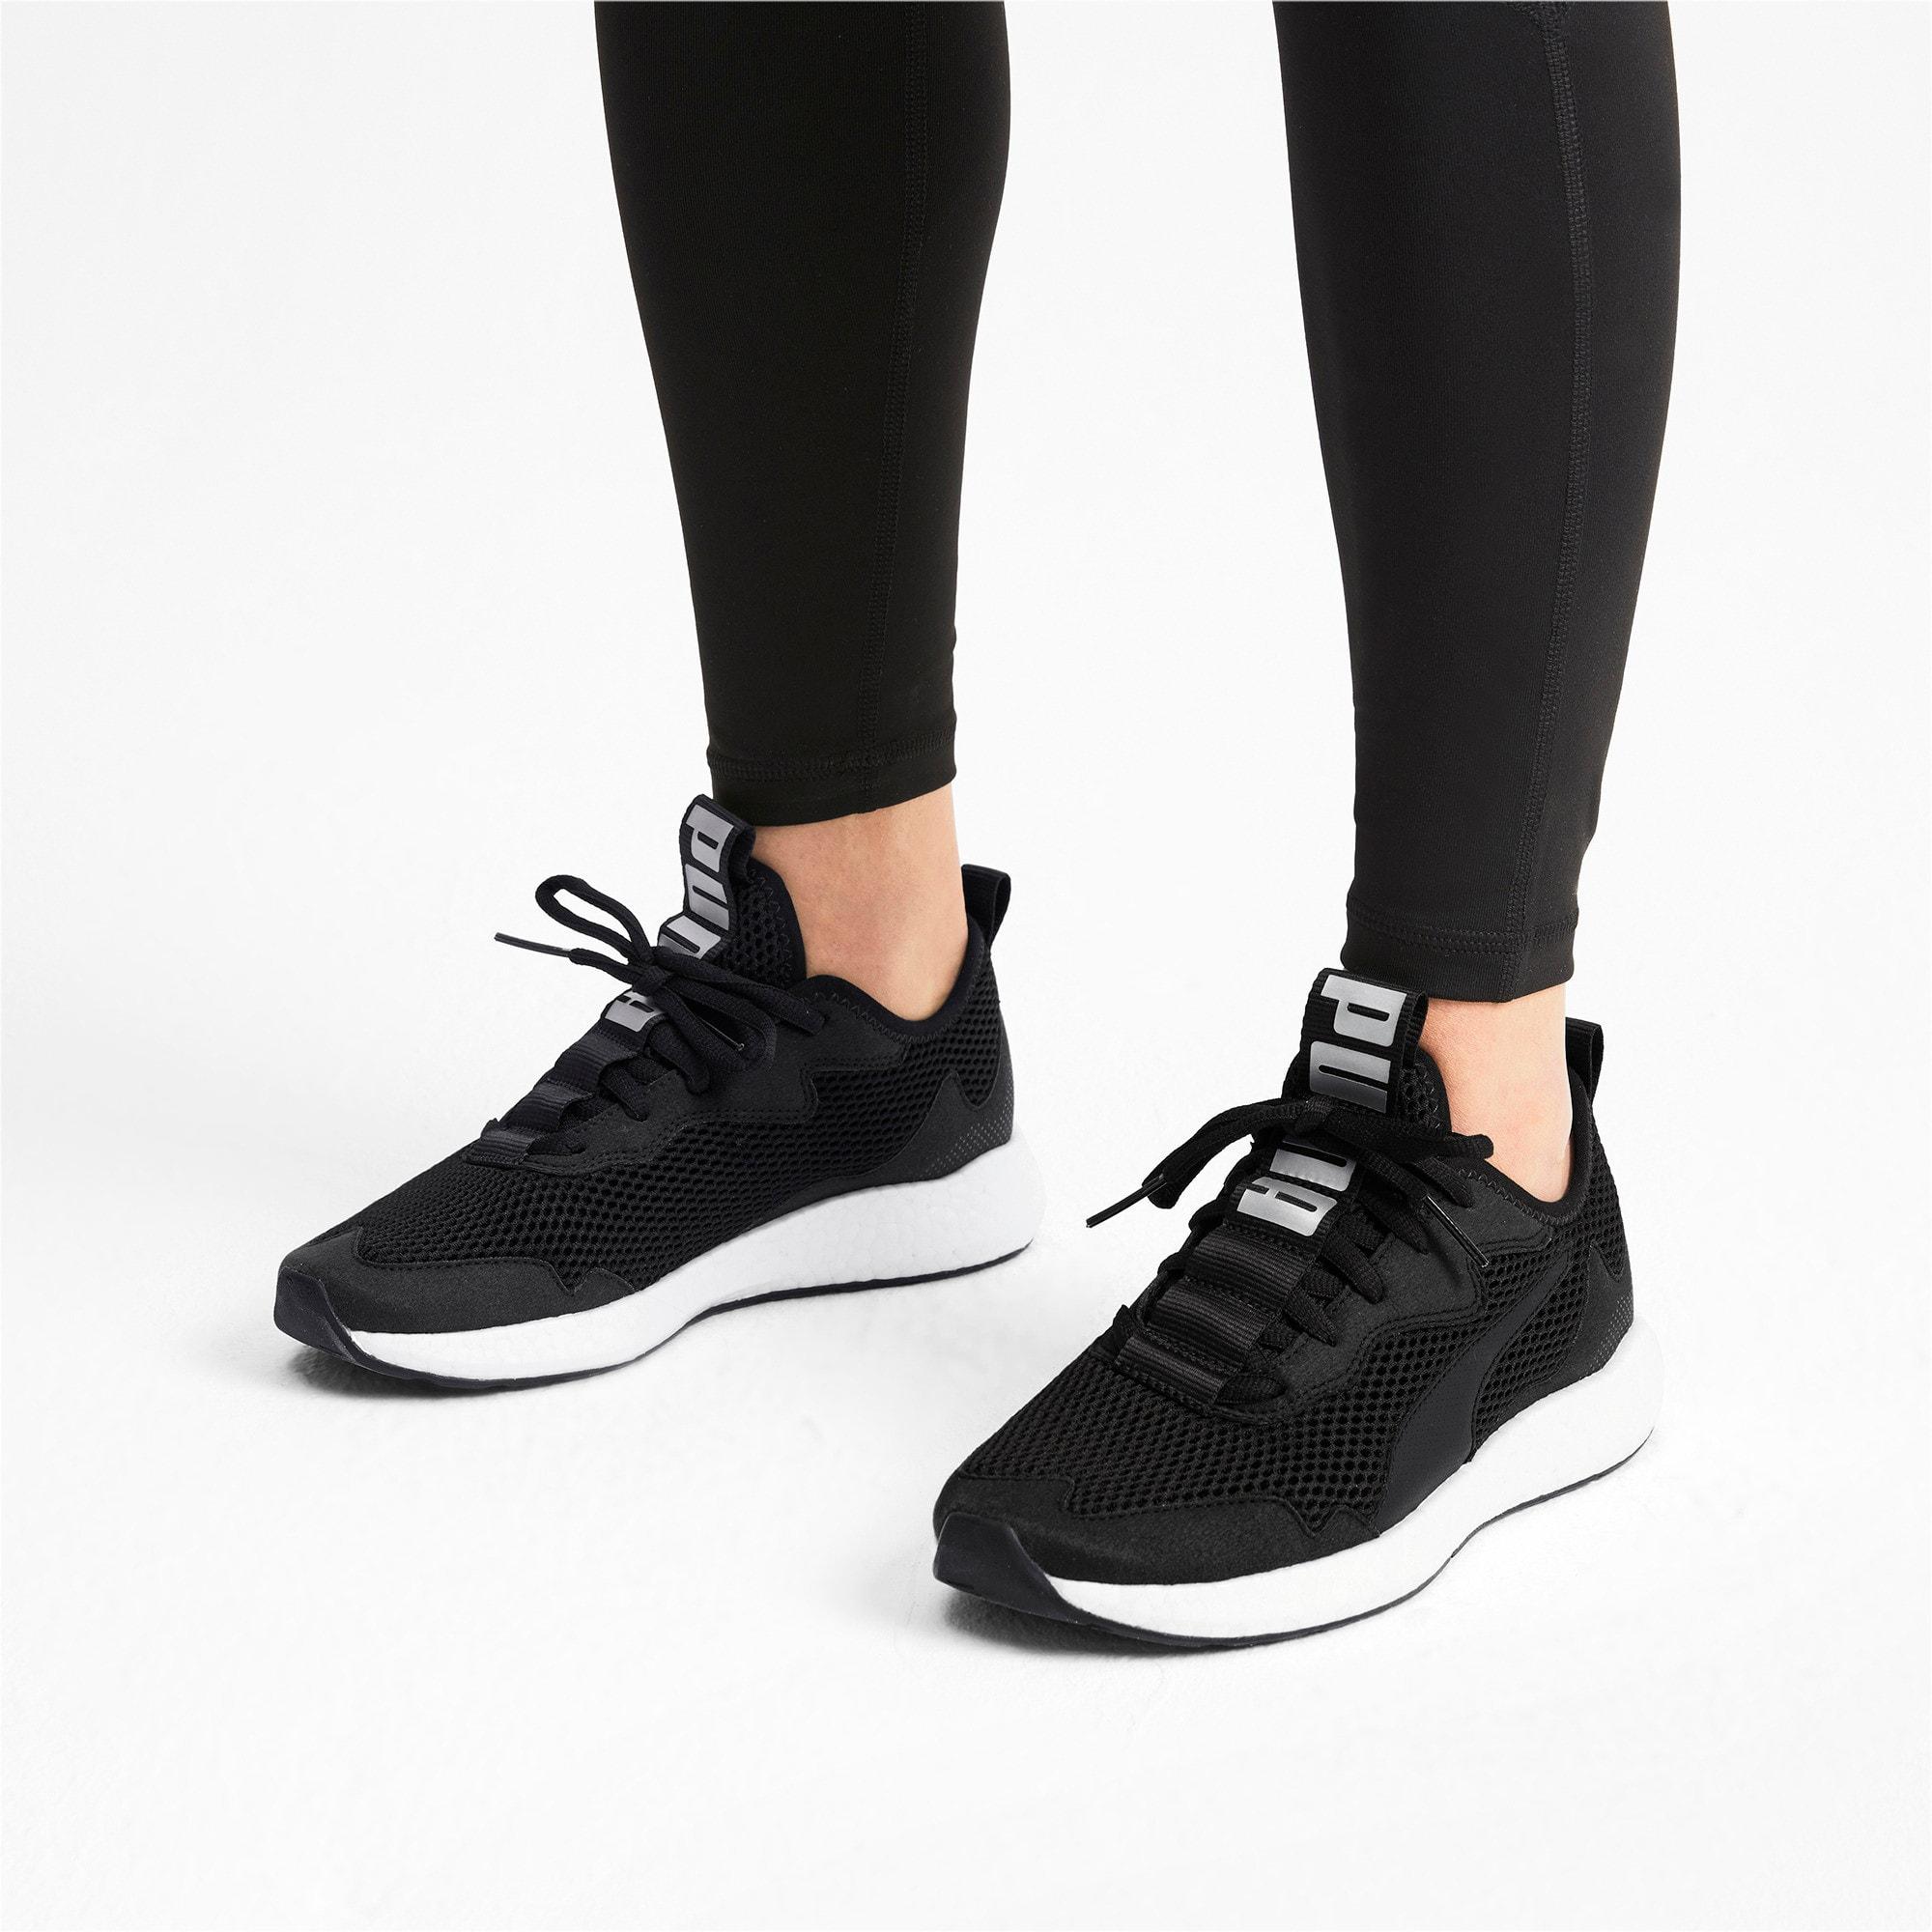 Thumbnail 3 of NRGY Neko Skim Women's Running Shoes, Puma Black-Puma Silver, medium-IND